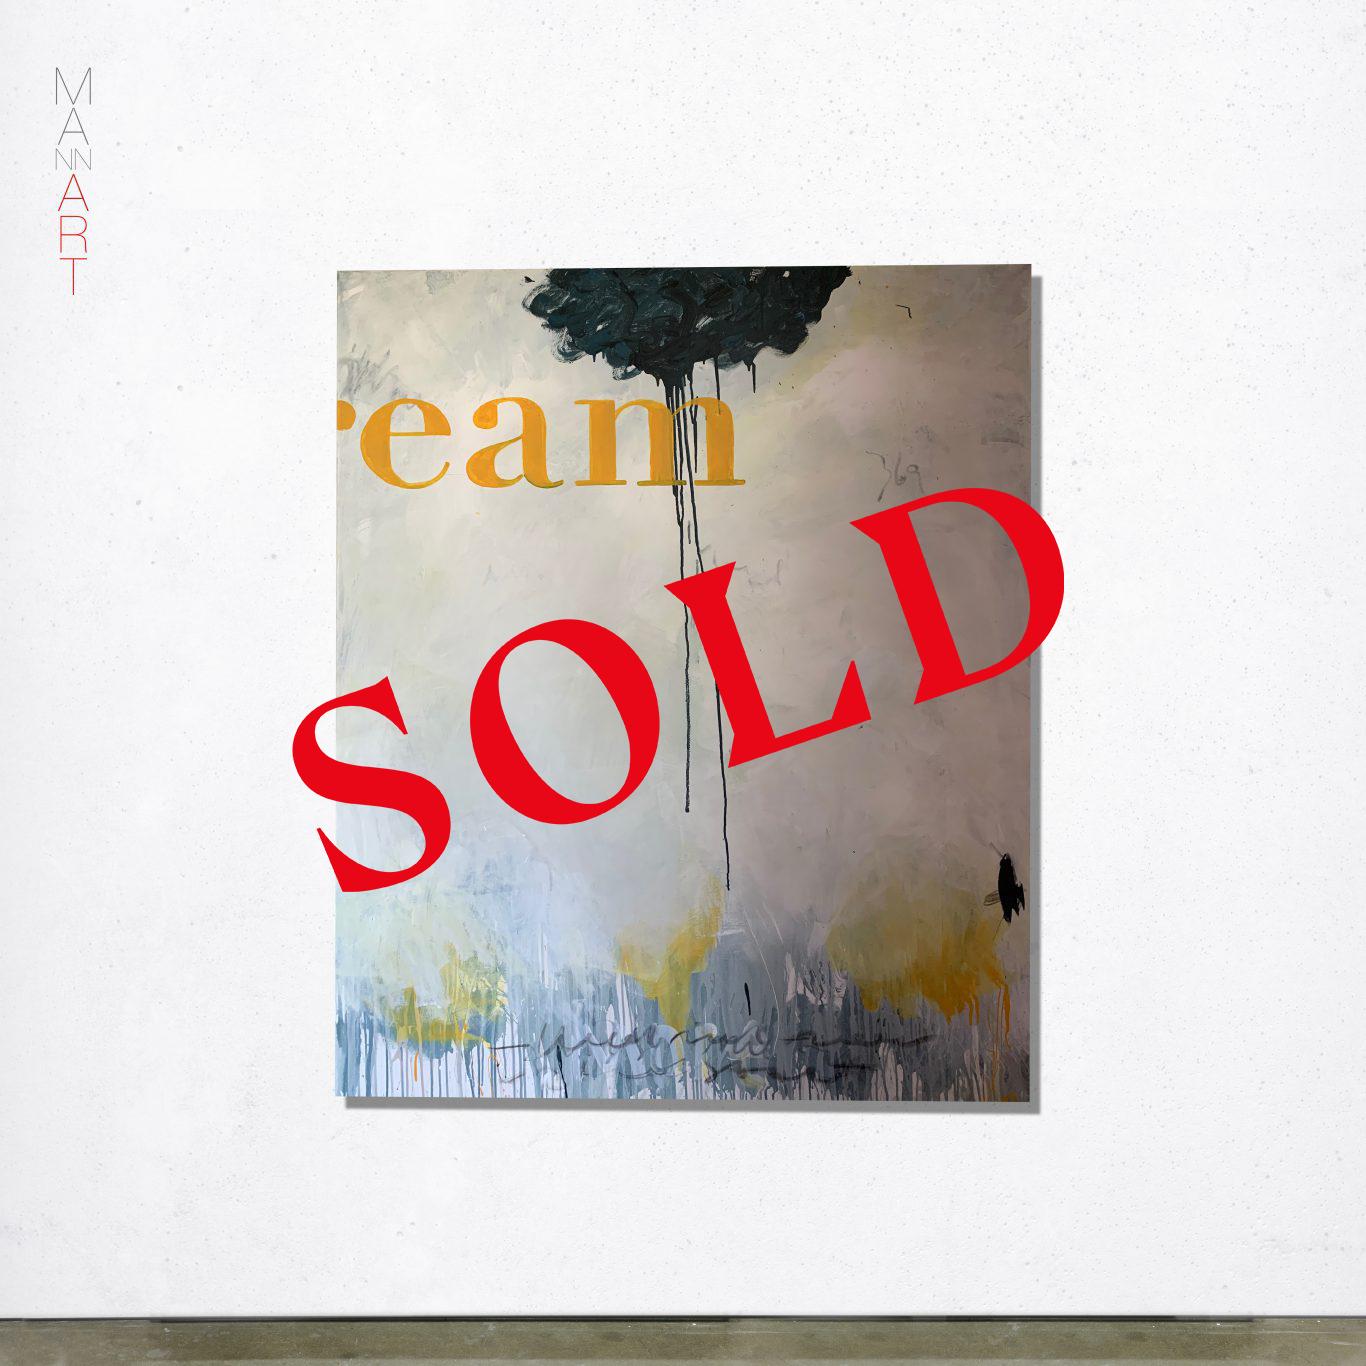 MANNA Art Dream / Sonho - Sold